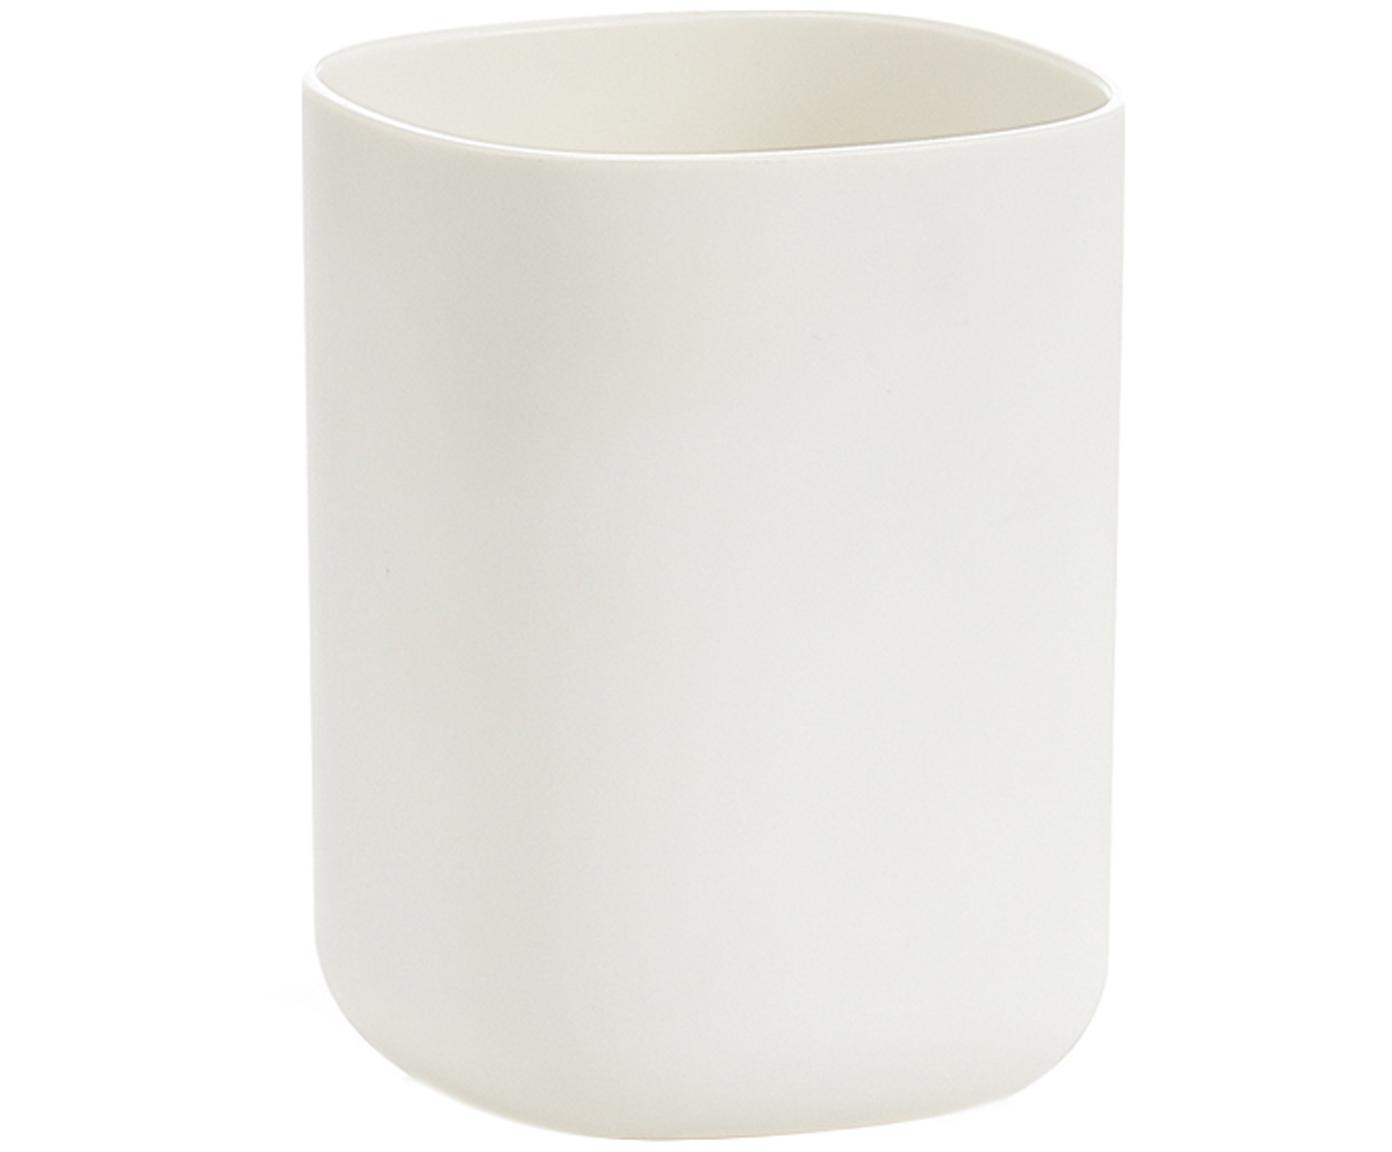 Zahnputzbecher Caro, Kunststoff, Weiß, 7 x 10 cm